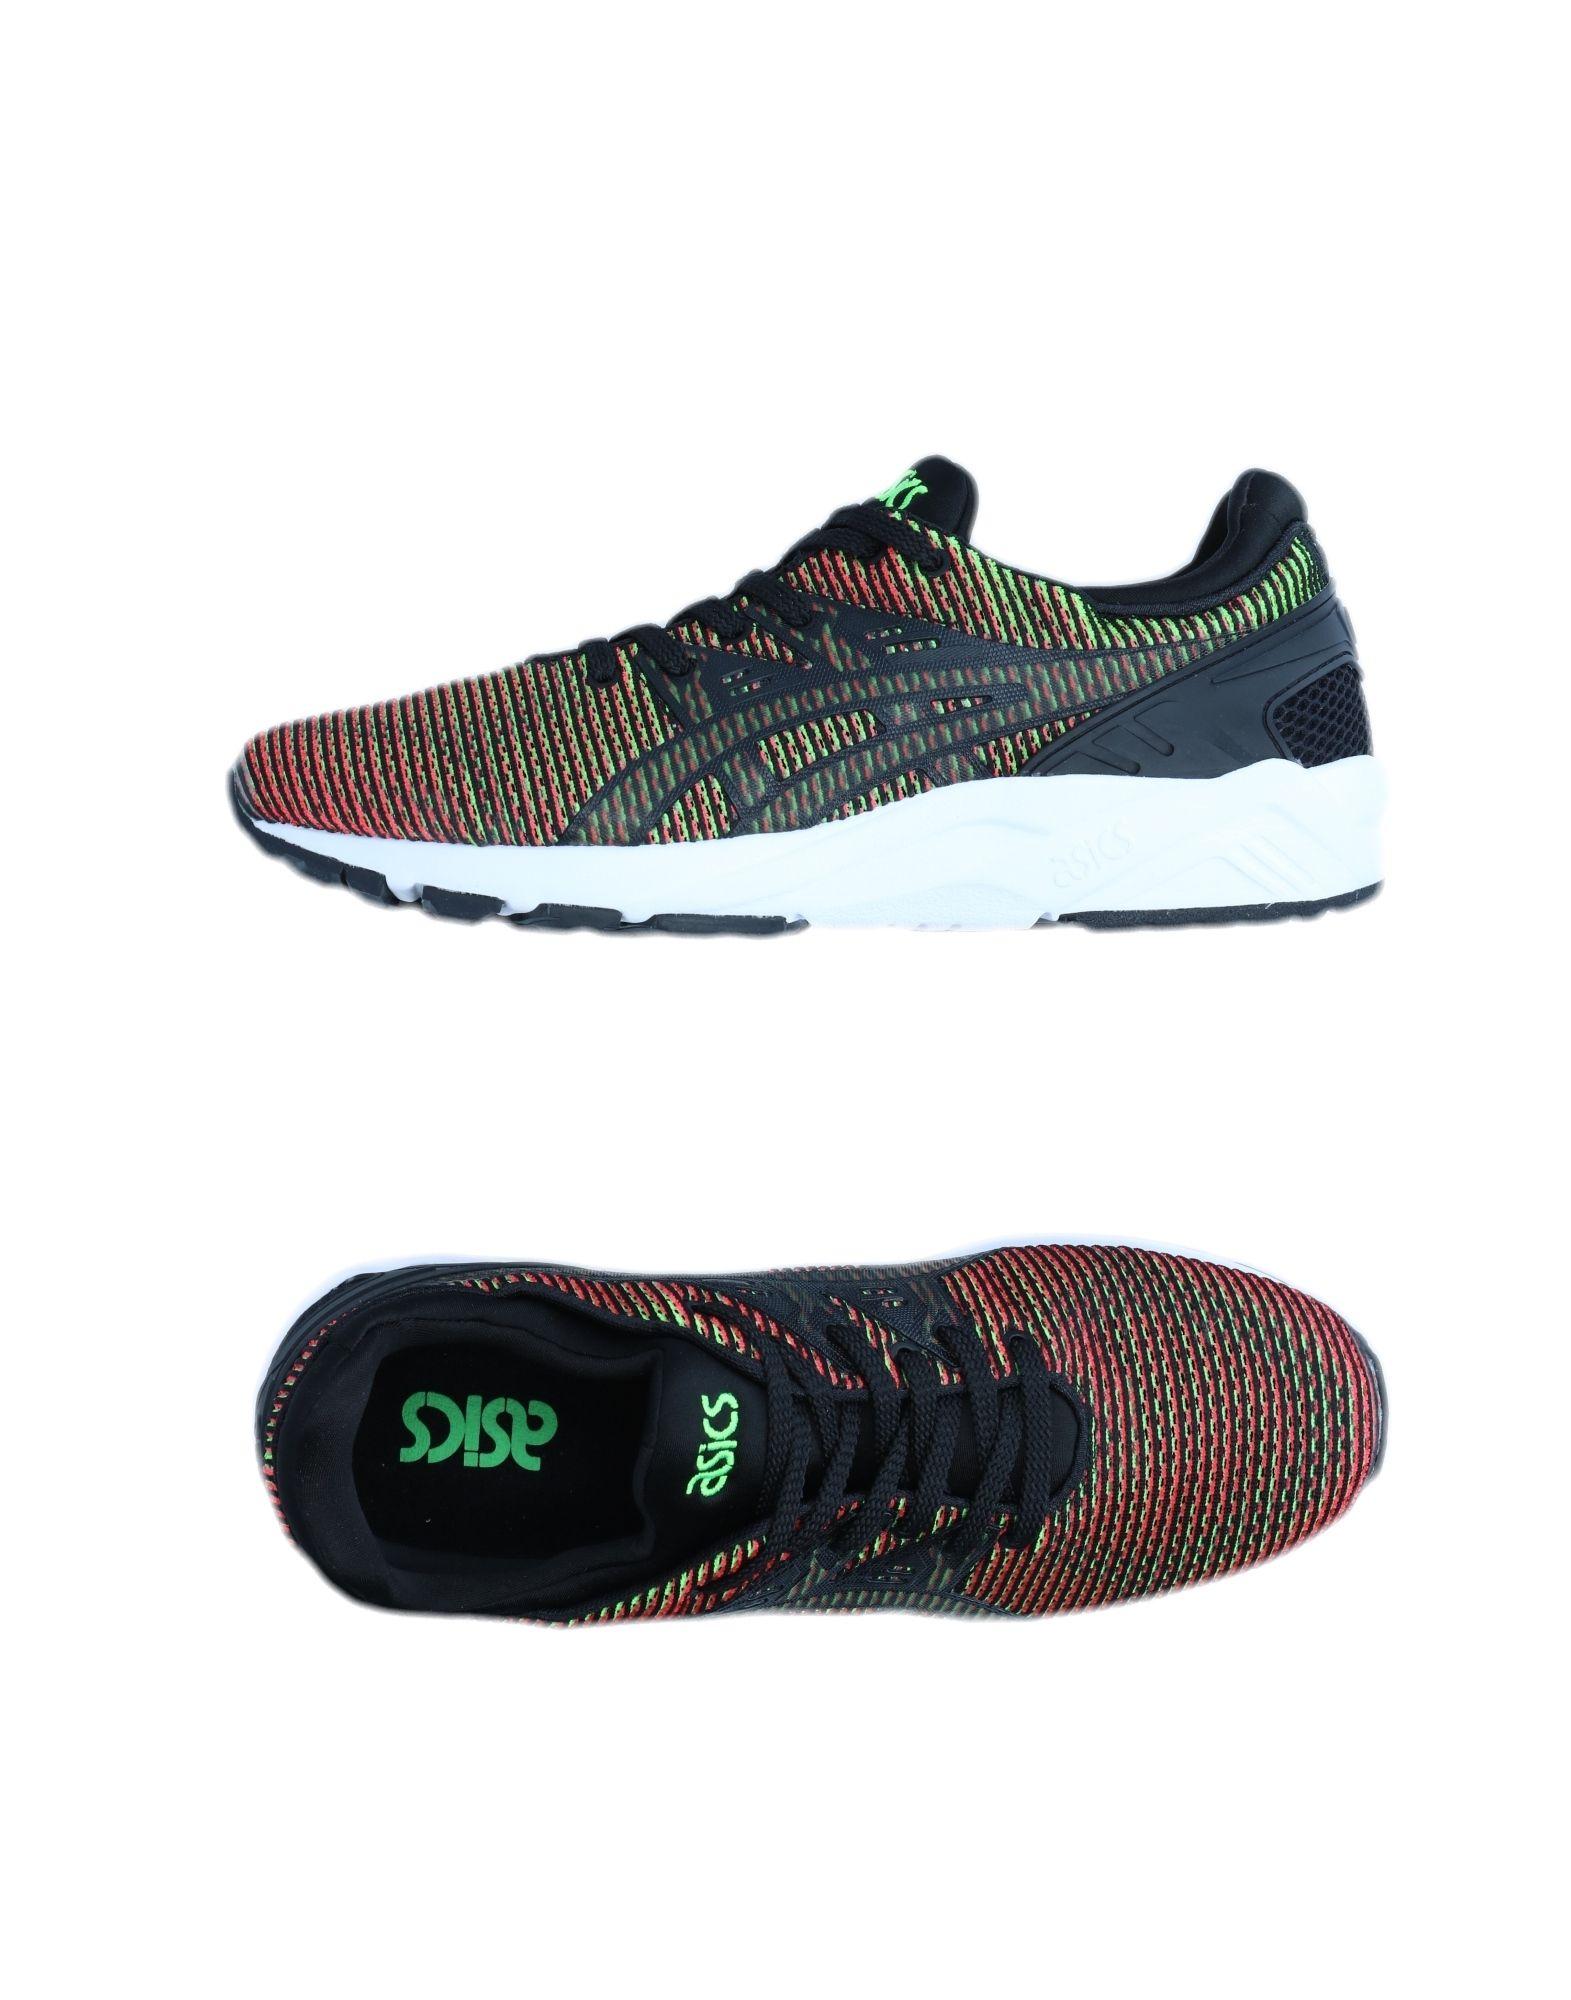 Rabatt echte  Schuhe Asics Sneakers Herren  echte 11232982TR 9308a7